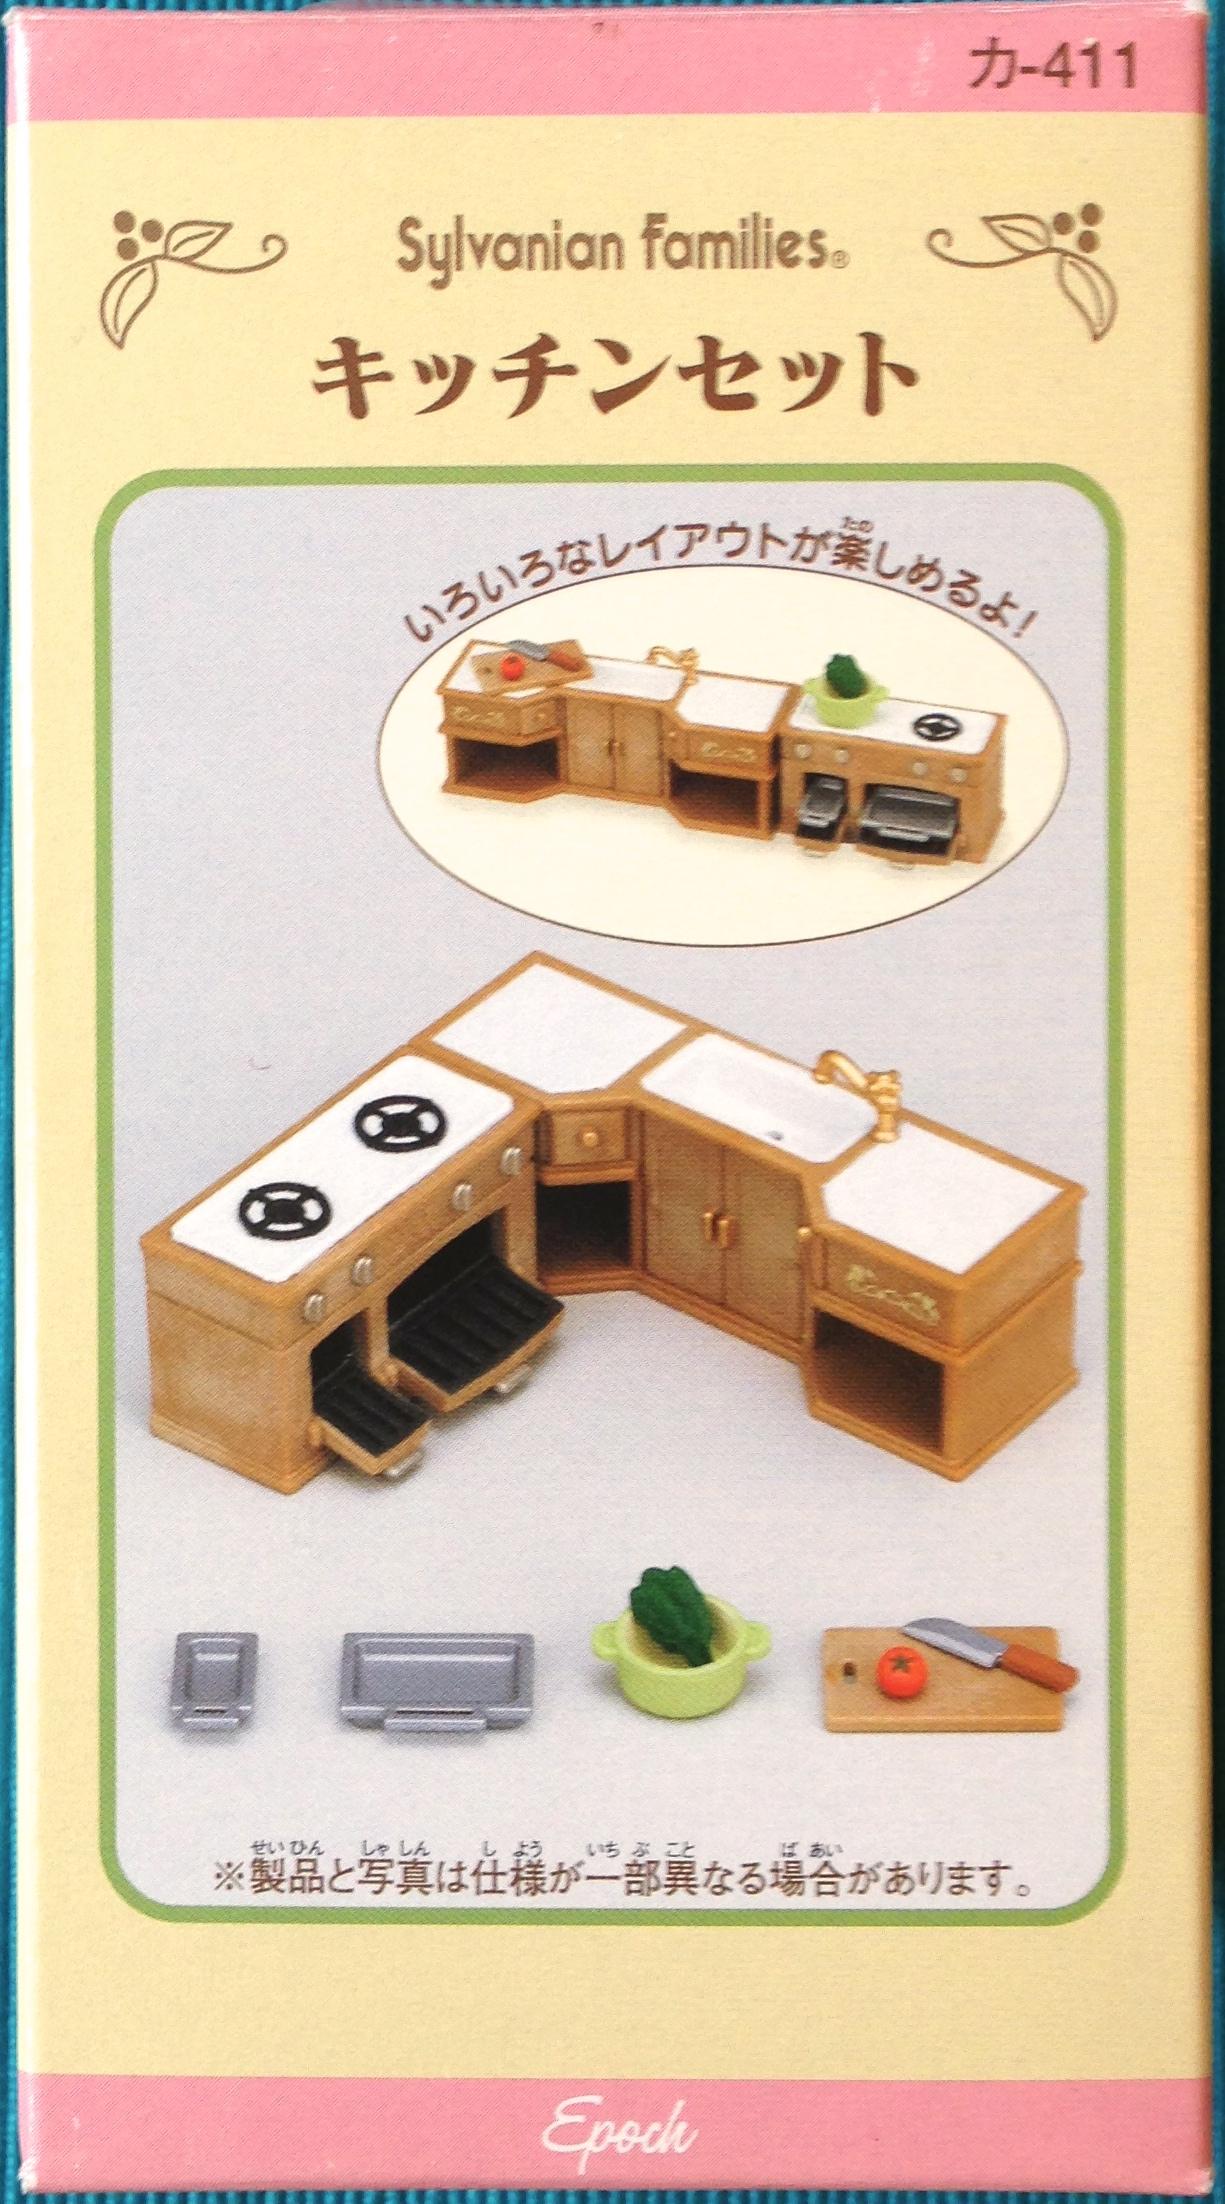 Sink Set EPOCH from Japan* Sylvanian Furniture Kitchen Stove